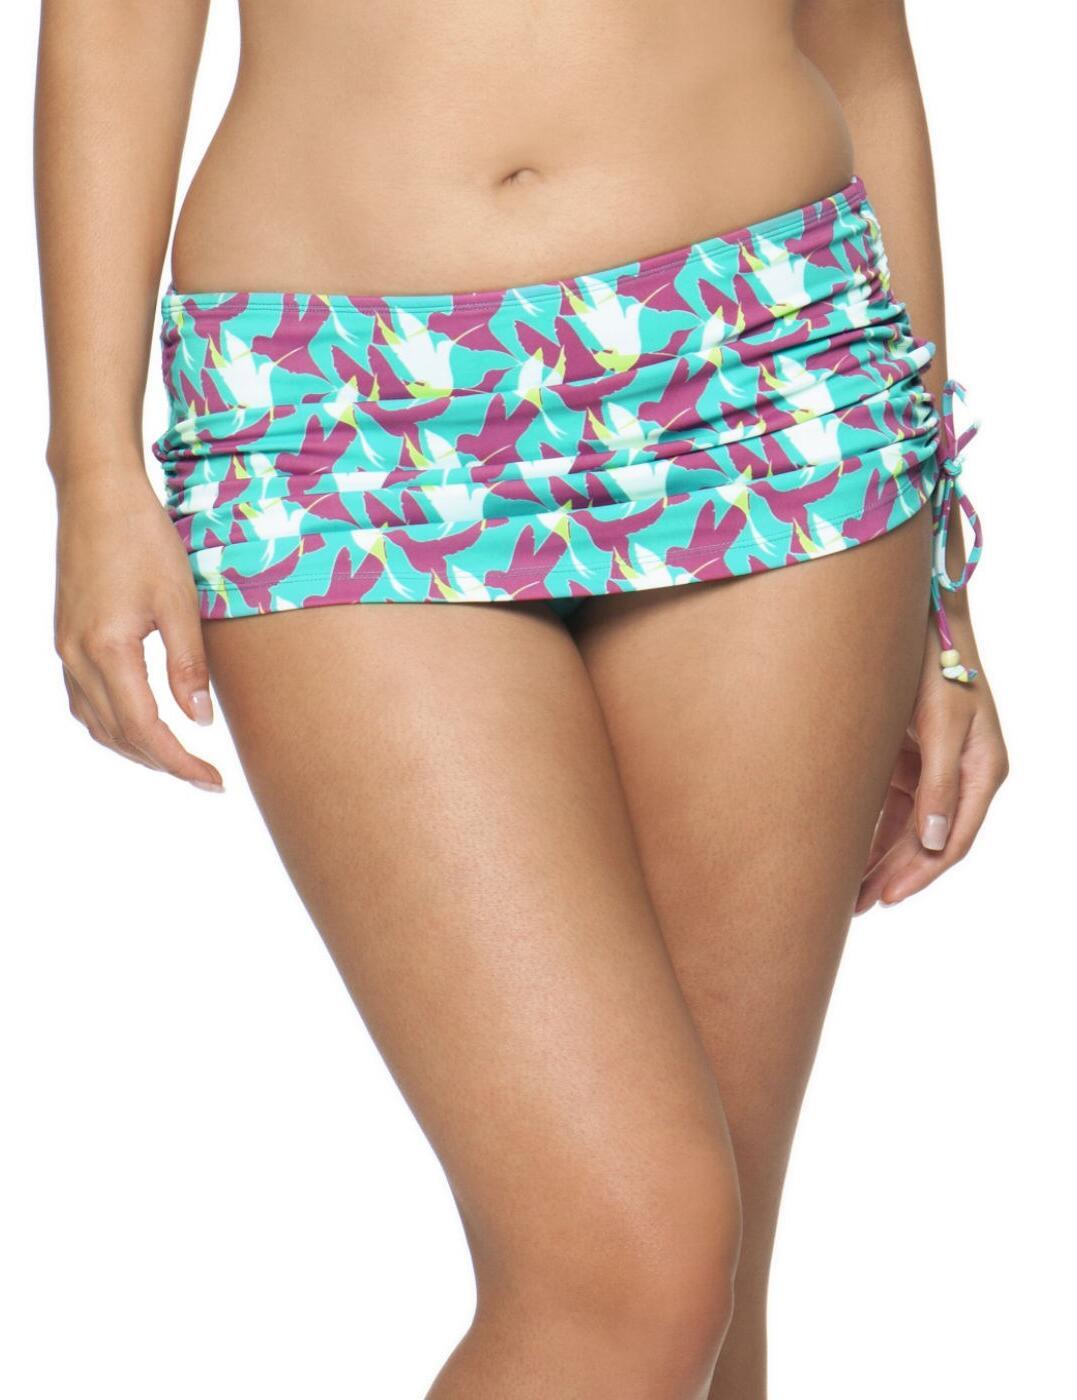 1455 Curvy Kate Birds of Paradise Swim Skirt - CS1455 Skirted Brief